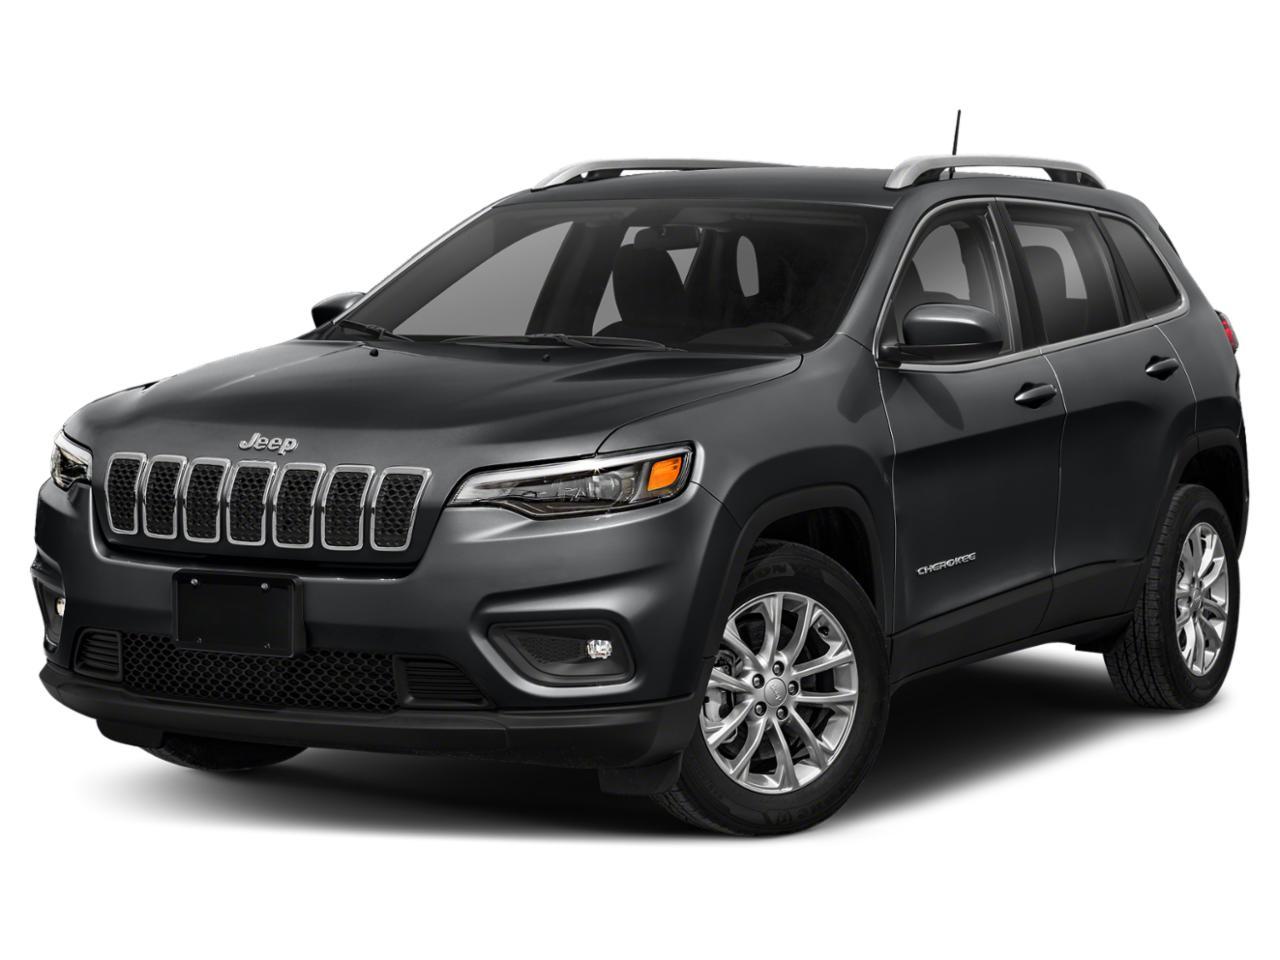 2019 Jeep Cherokee Vehicle Photo in Appleton, WI 54913